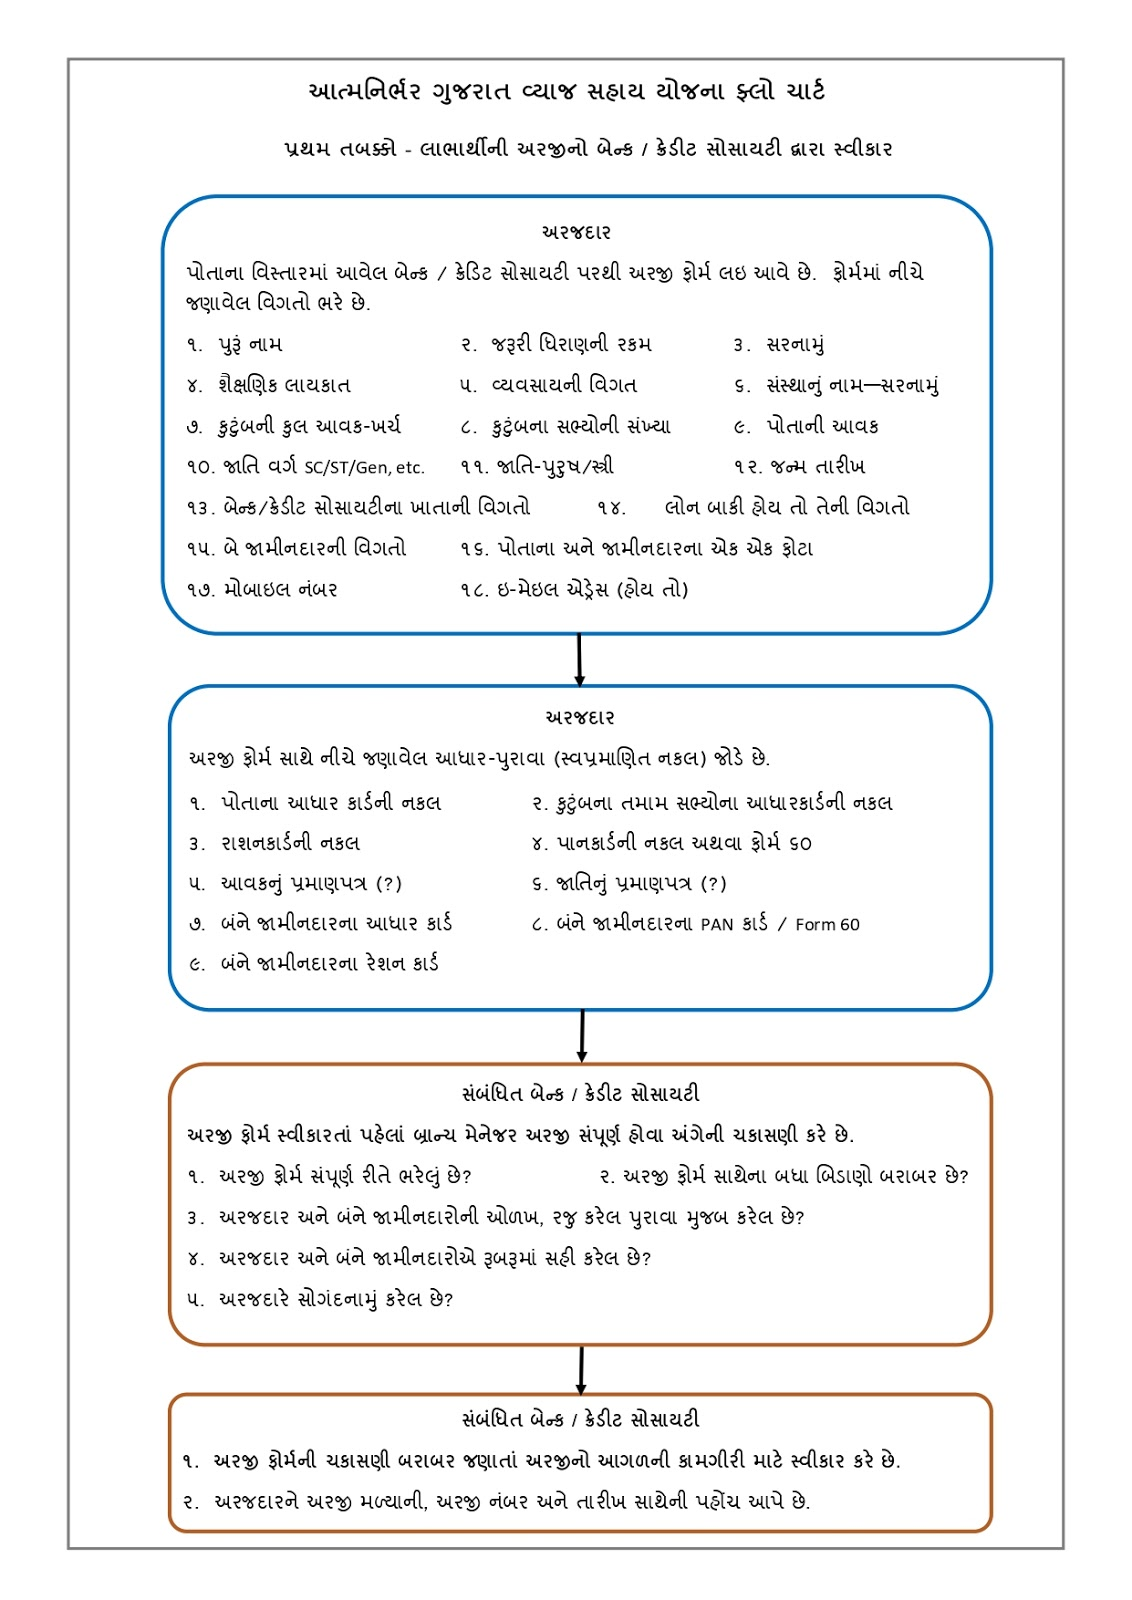 Aatma nirbhar Gujarat Sahay Yojana Apply Online Form